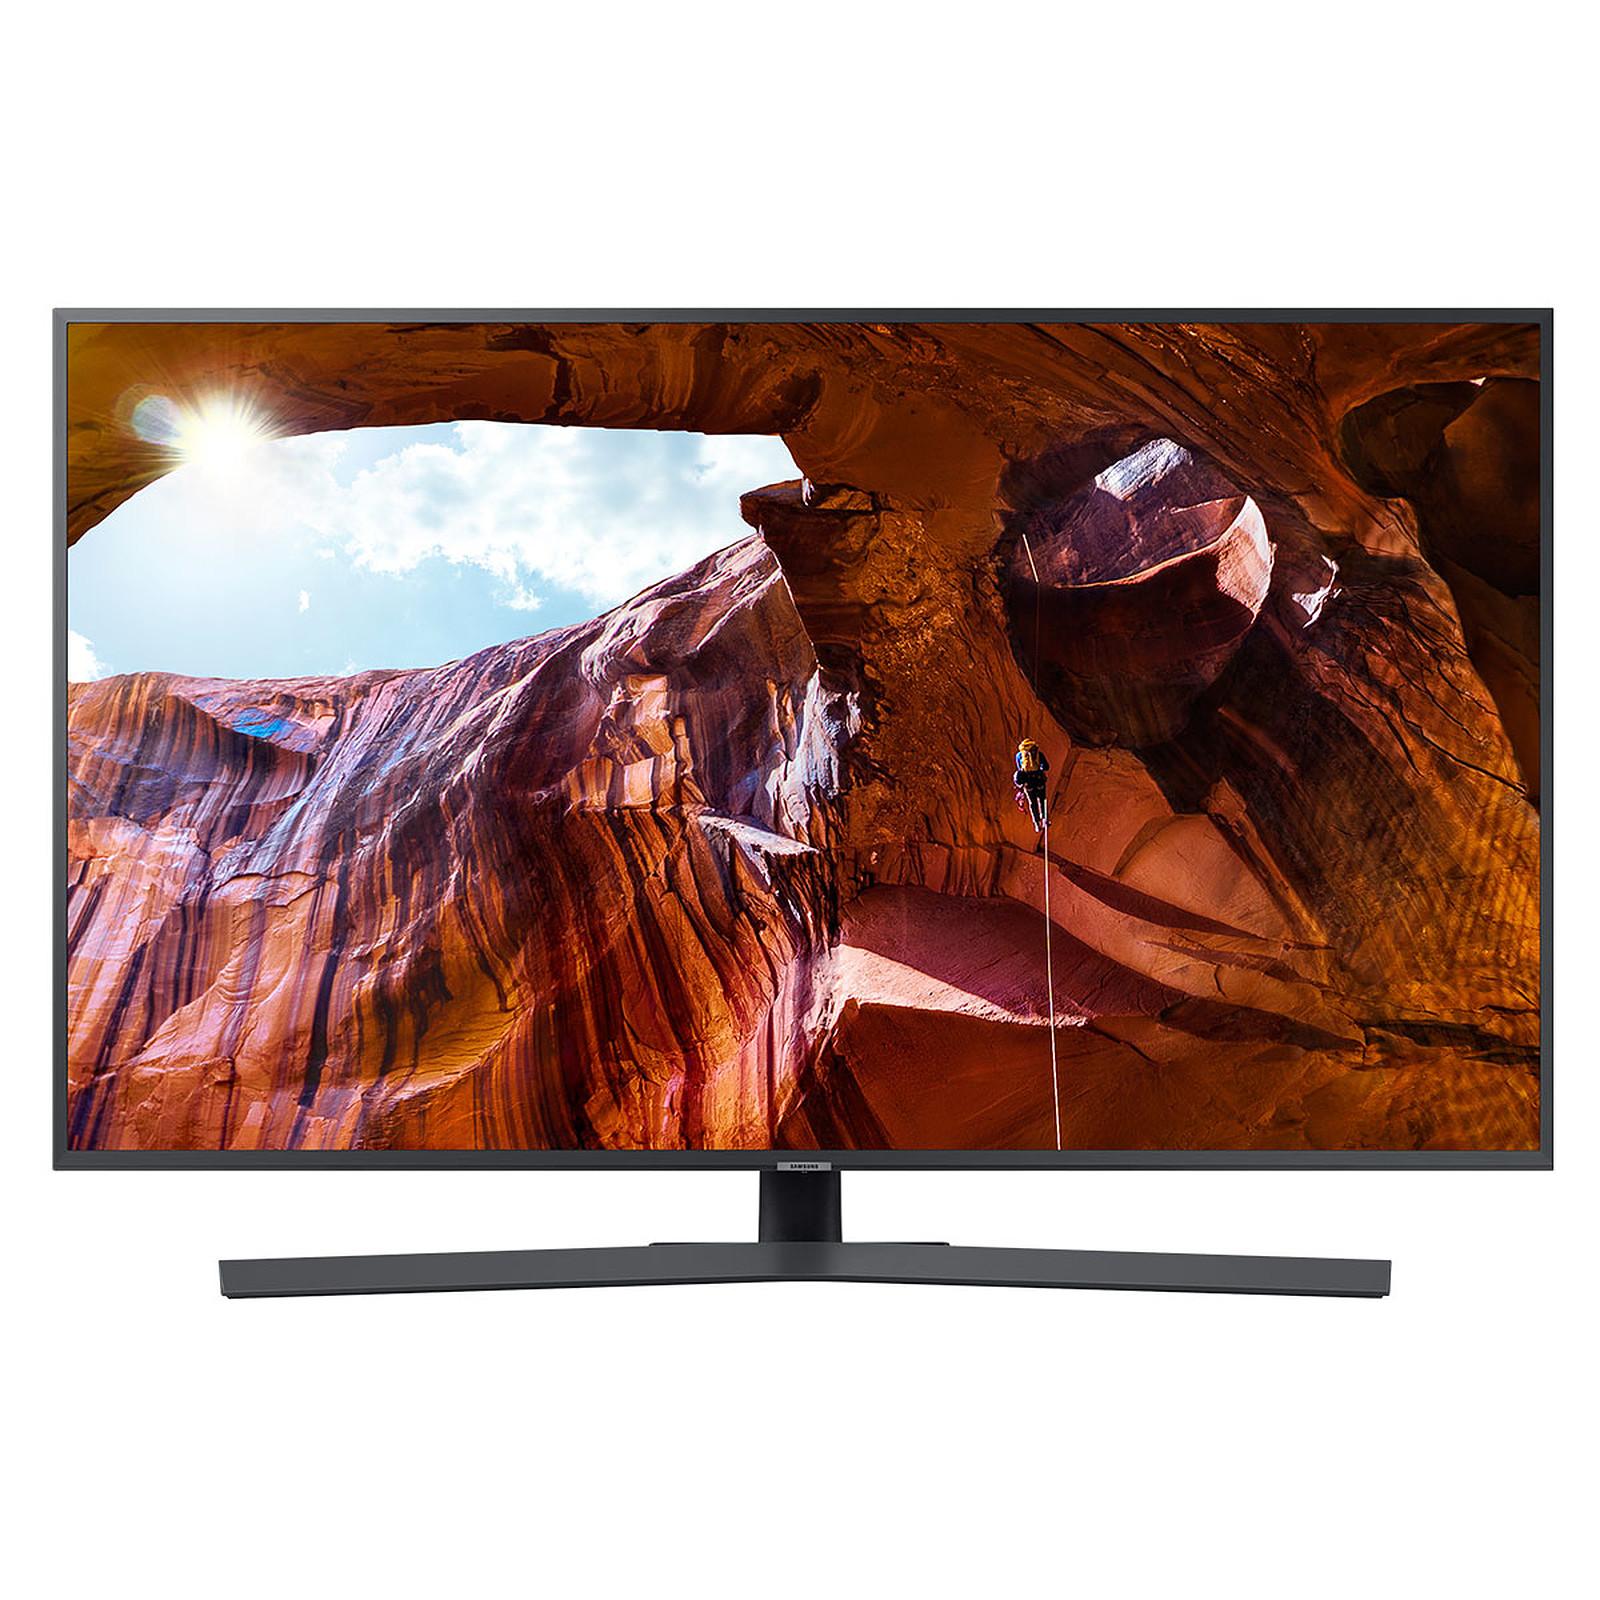 "TV 55"" Samsung UE55RU7405 (2019) - LED, 4K UHD, HDR 10+, 1900 PQI, Smart TV (Via ODR de 20%)"